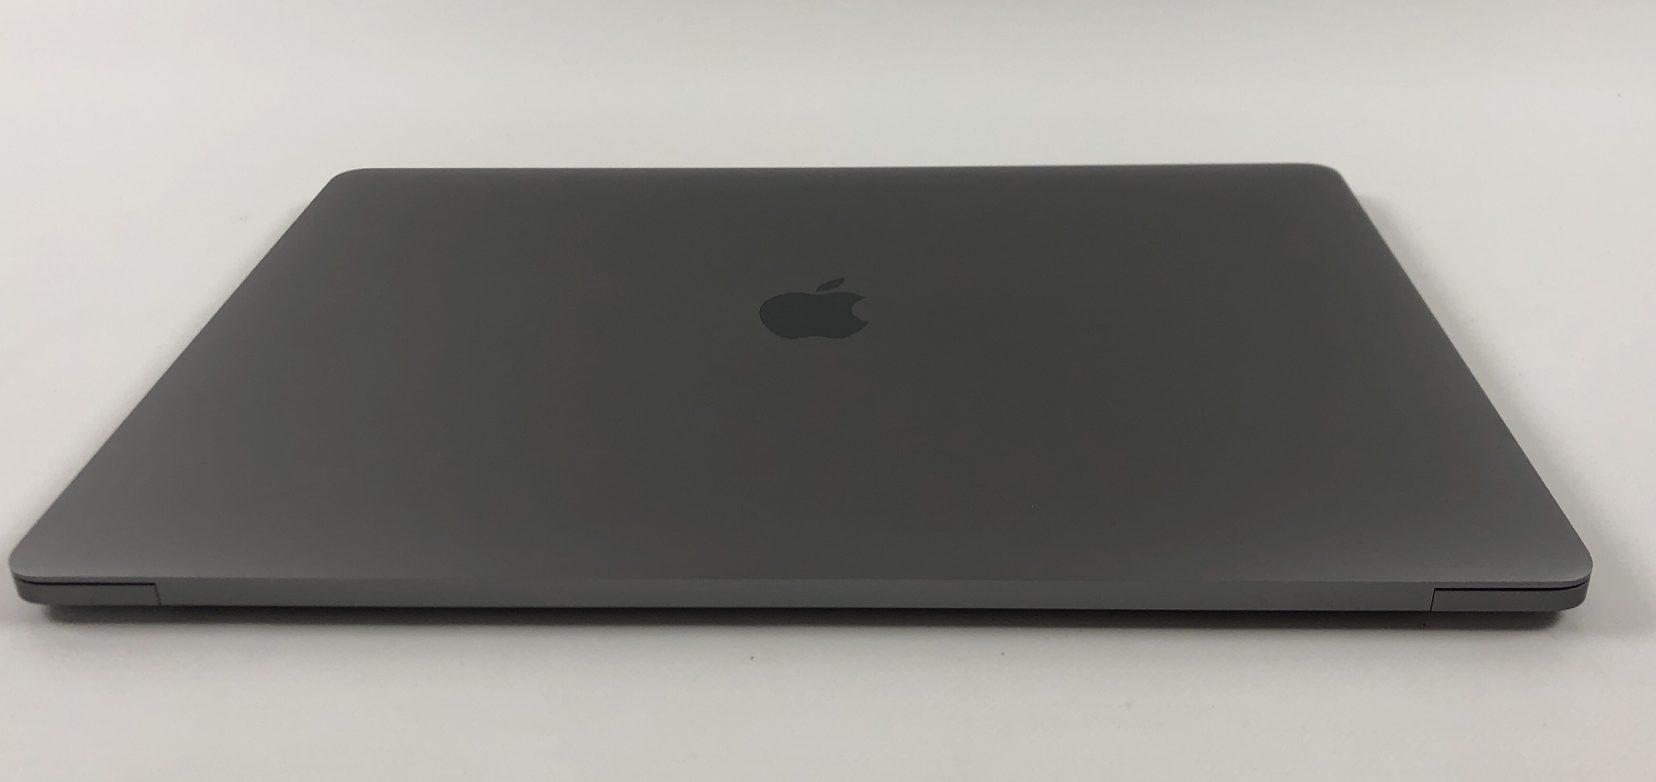 "MacBook Pro 15"" Touch Bar Late 2016 (Intel Quad-Core i7 2.7 GHz 16 GB RAM 512 GB SSD), Space Gray, Intel Quad-Core i7 2.7 GHz, 16 GB RAM, 512 GB SSD, obraz 3"